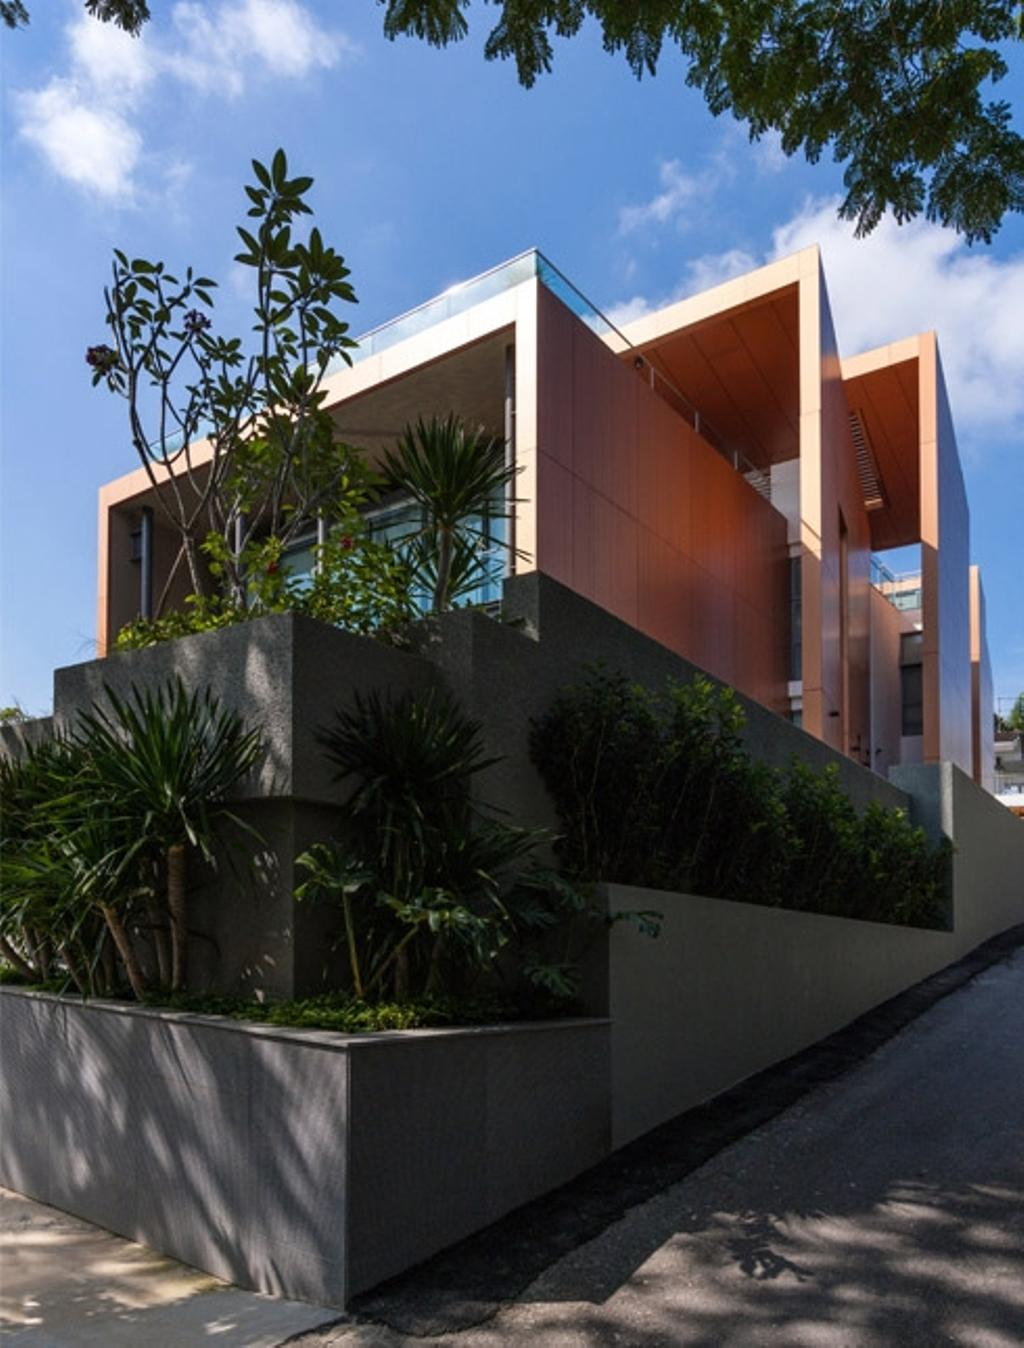 Modern, Landed, Trevose, Architect, Timur Designs, Flora, Jar, Plant, Potted Plant, Pottery, Vase, Building, House, Housing, Villa, Arecaceae, Palm Tree, Tree